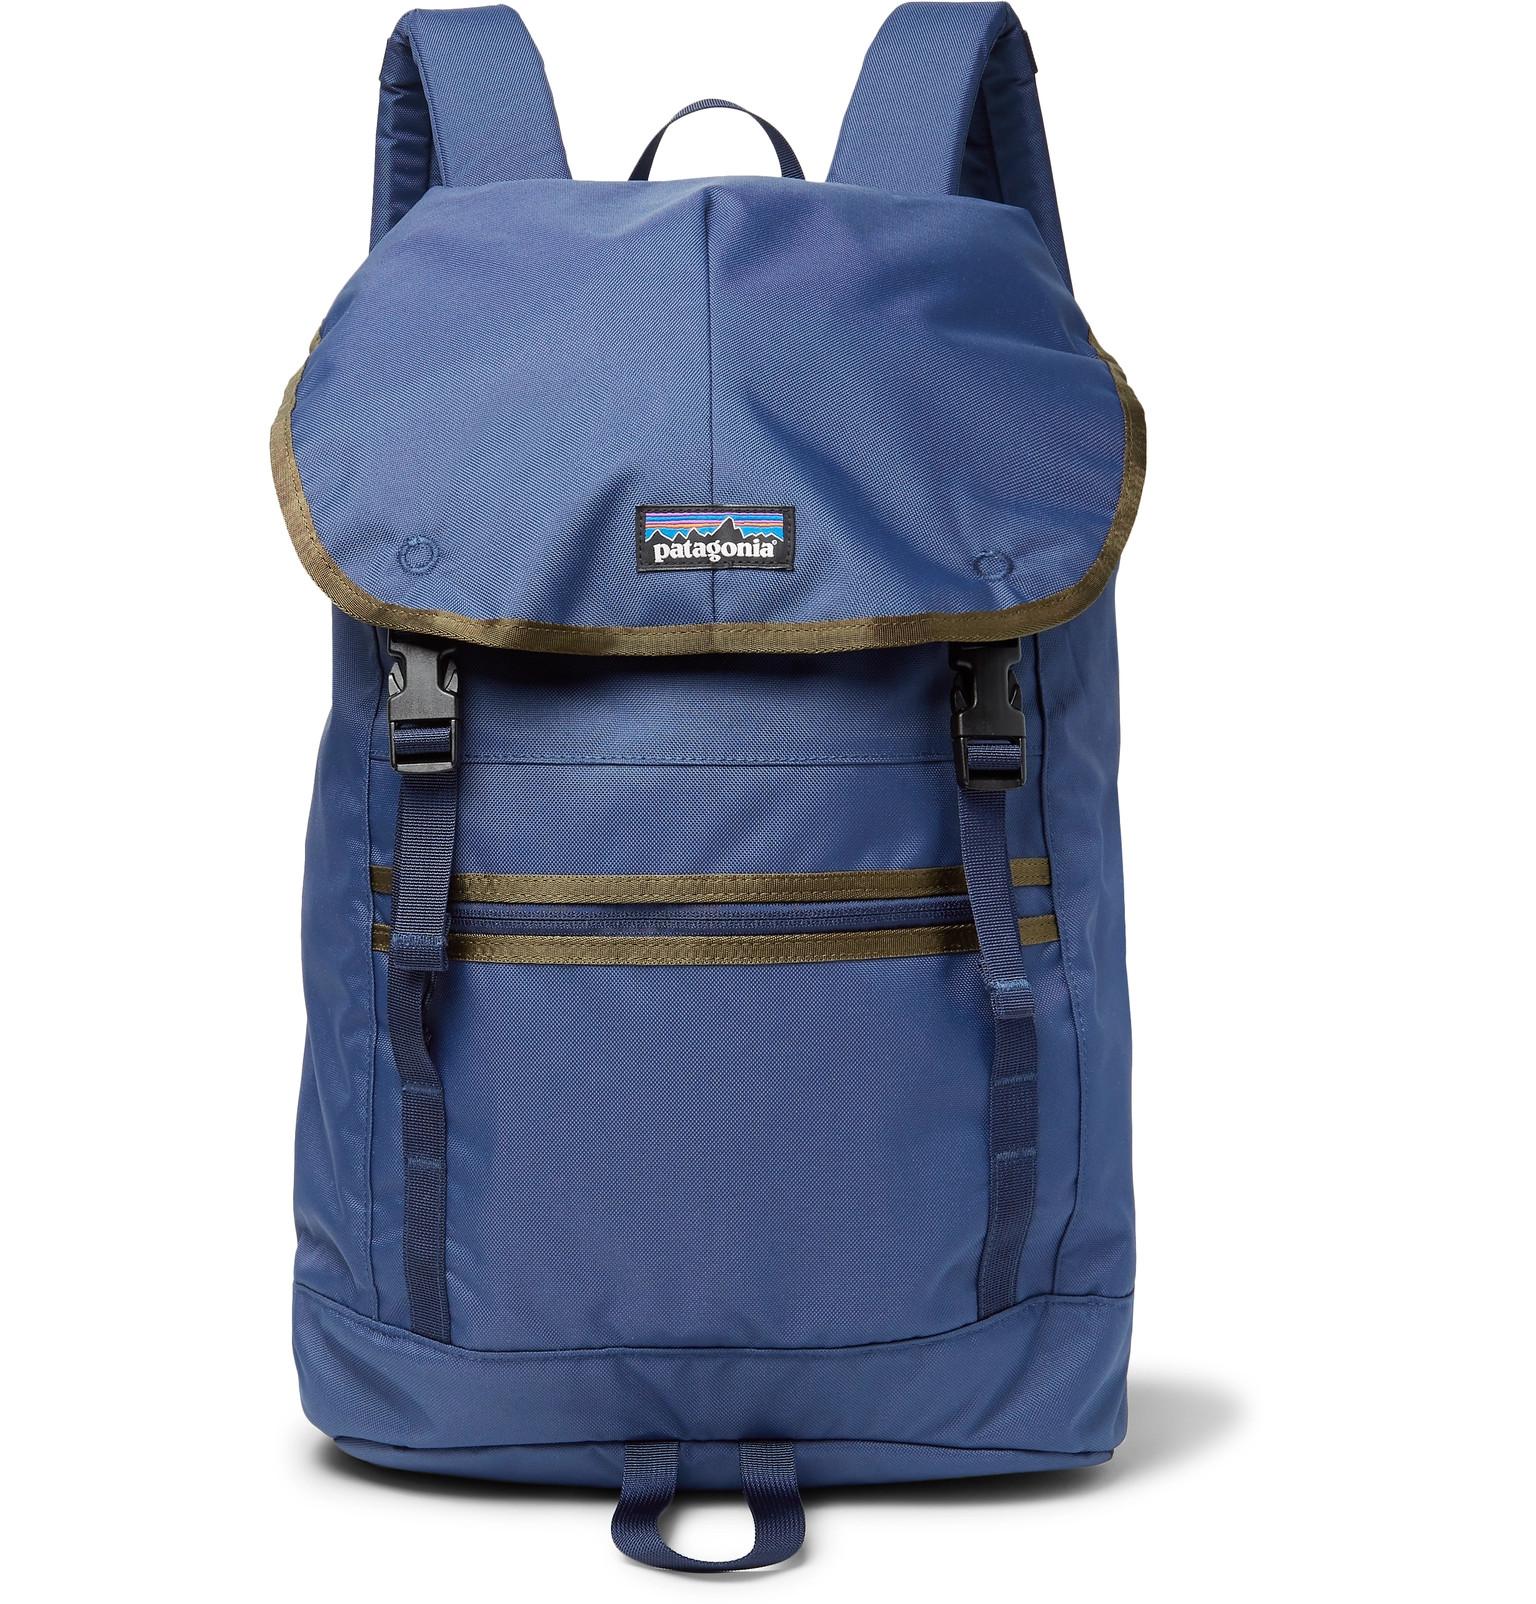 Patagonia Backpack Straps- Fenix Toulouse Handball 8b987a9001e94